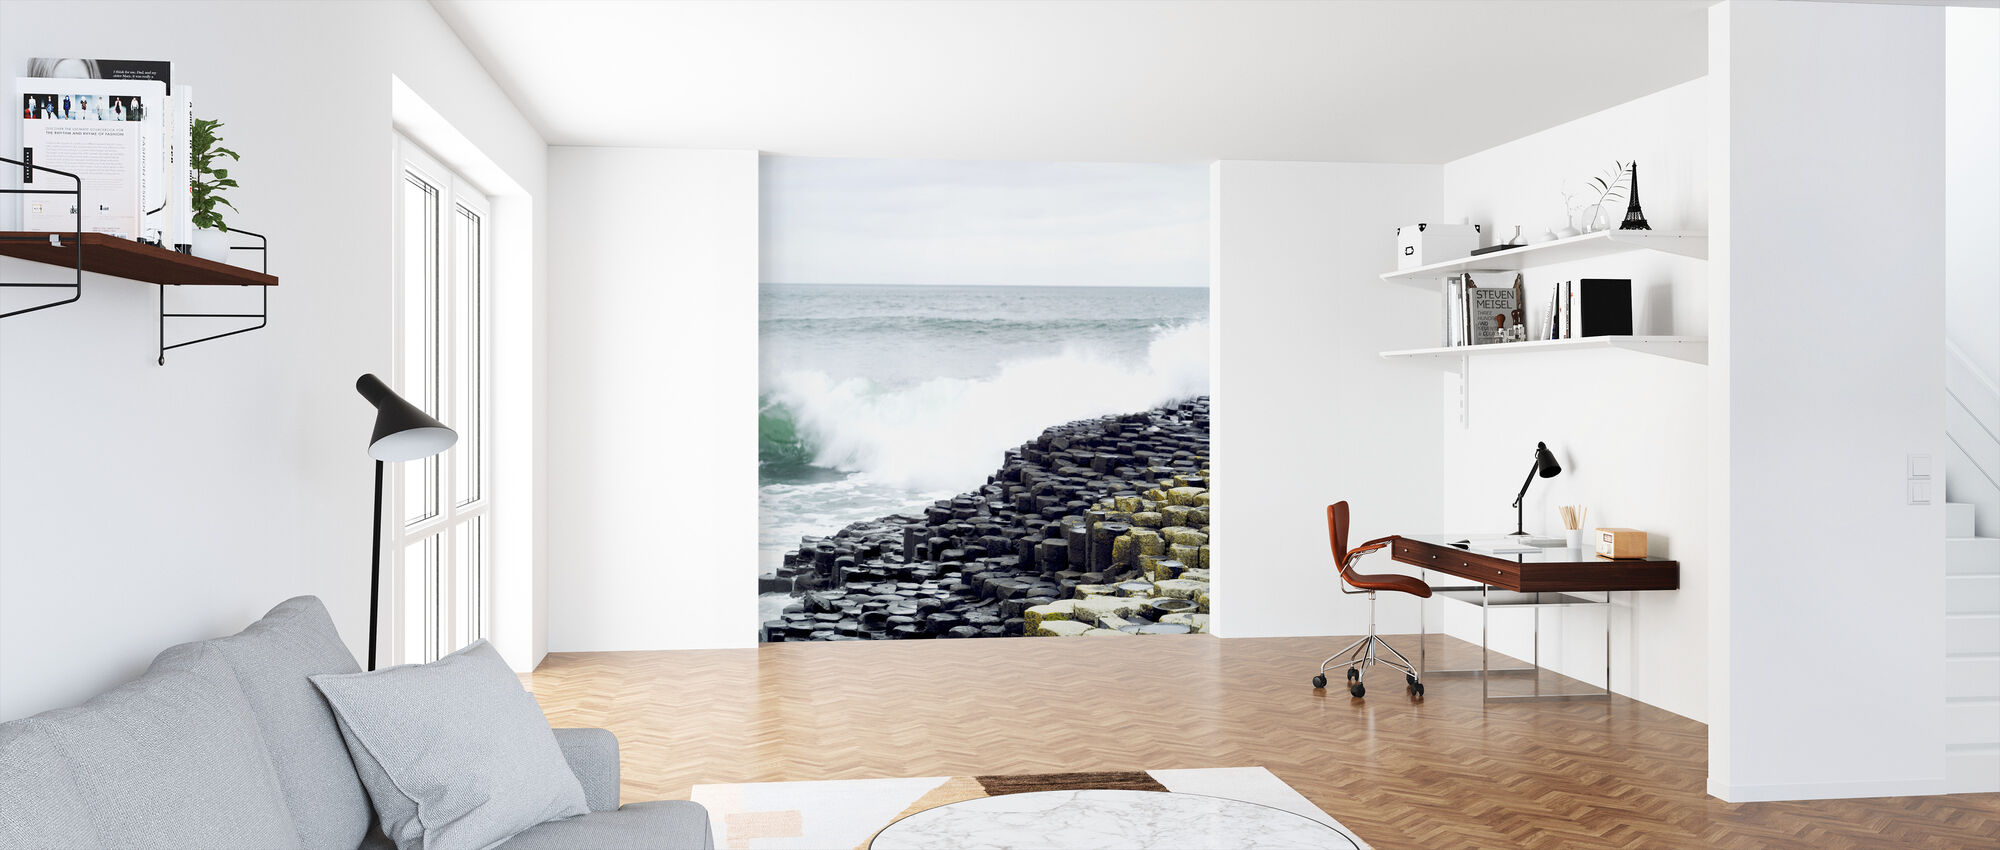 Waves Crashing in Giants Causeway - Wallpaper - Office